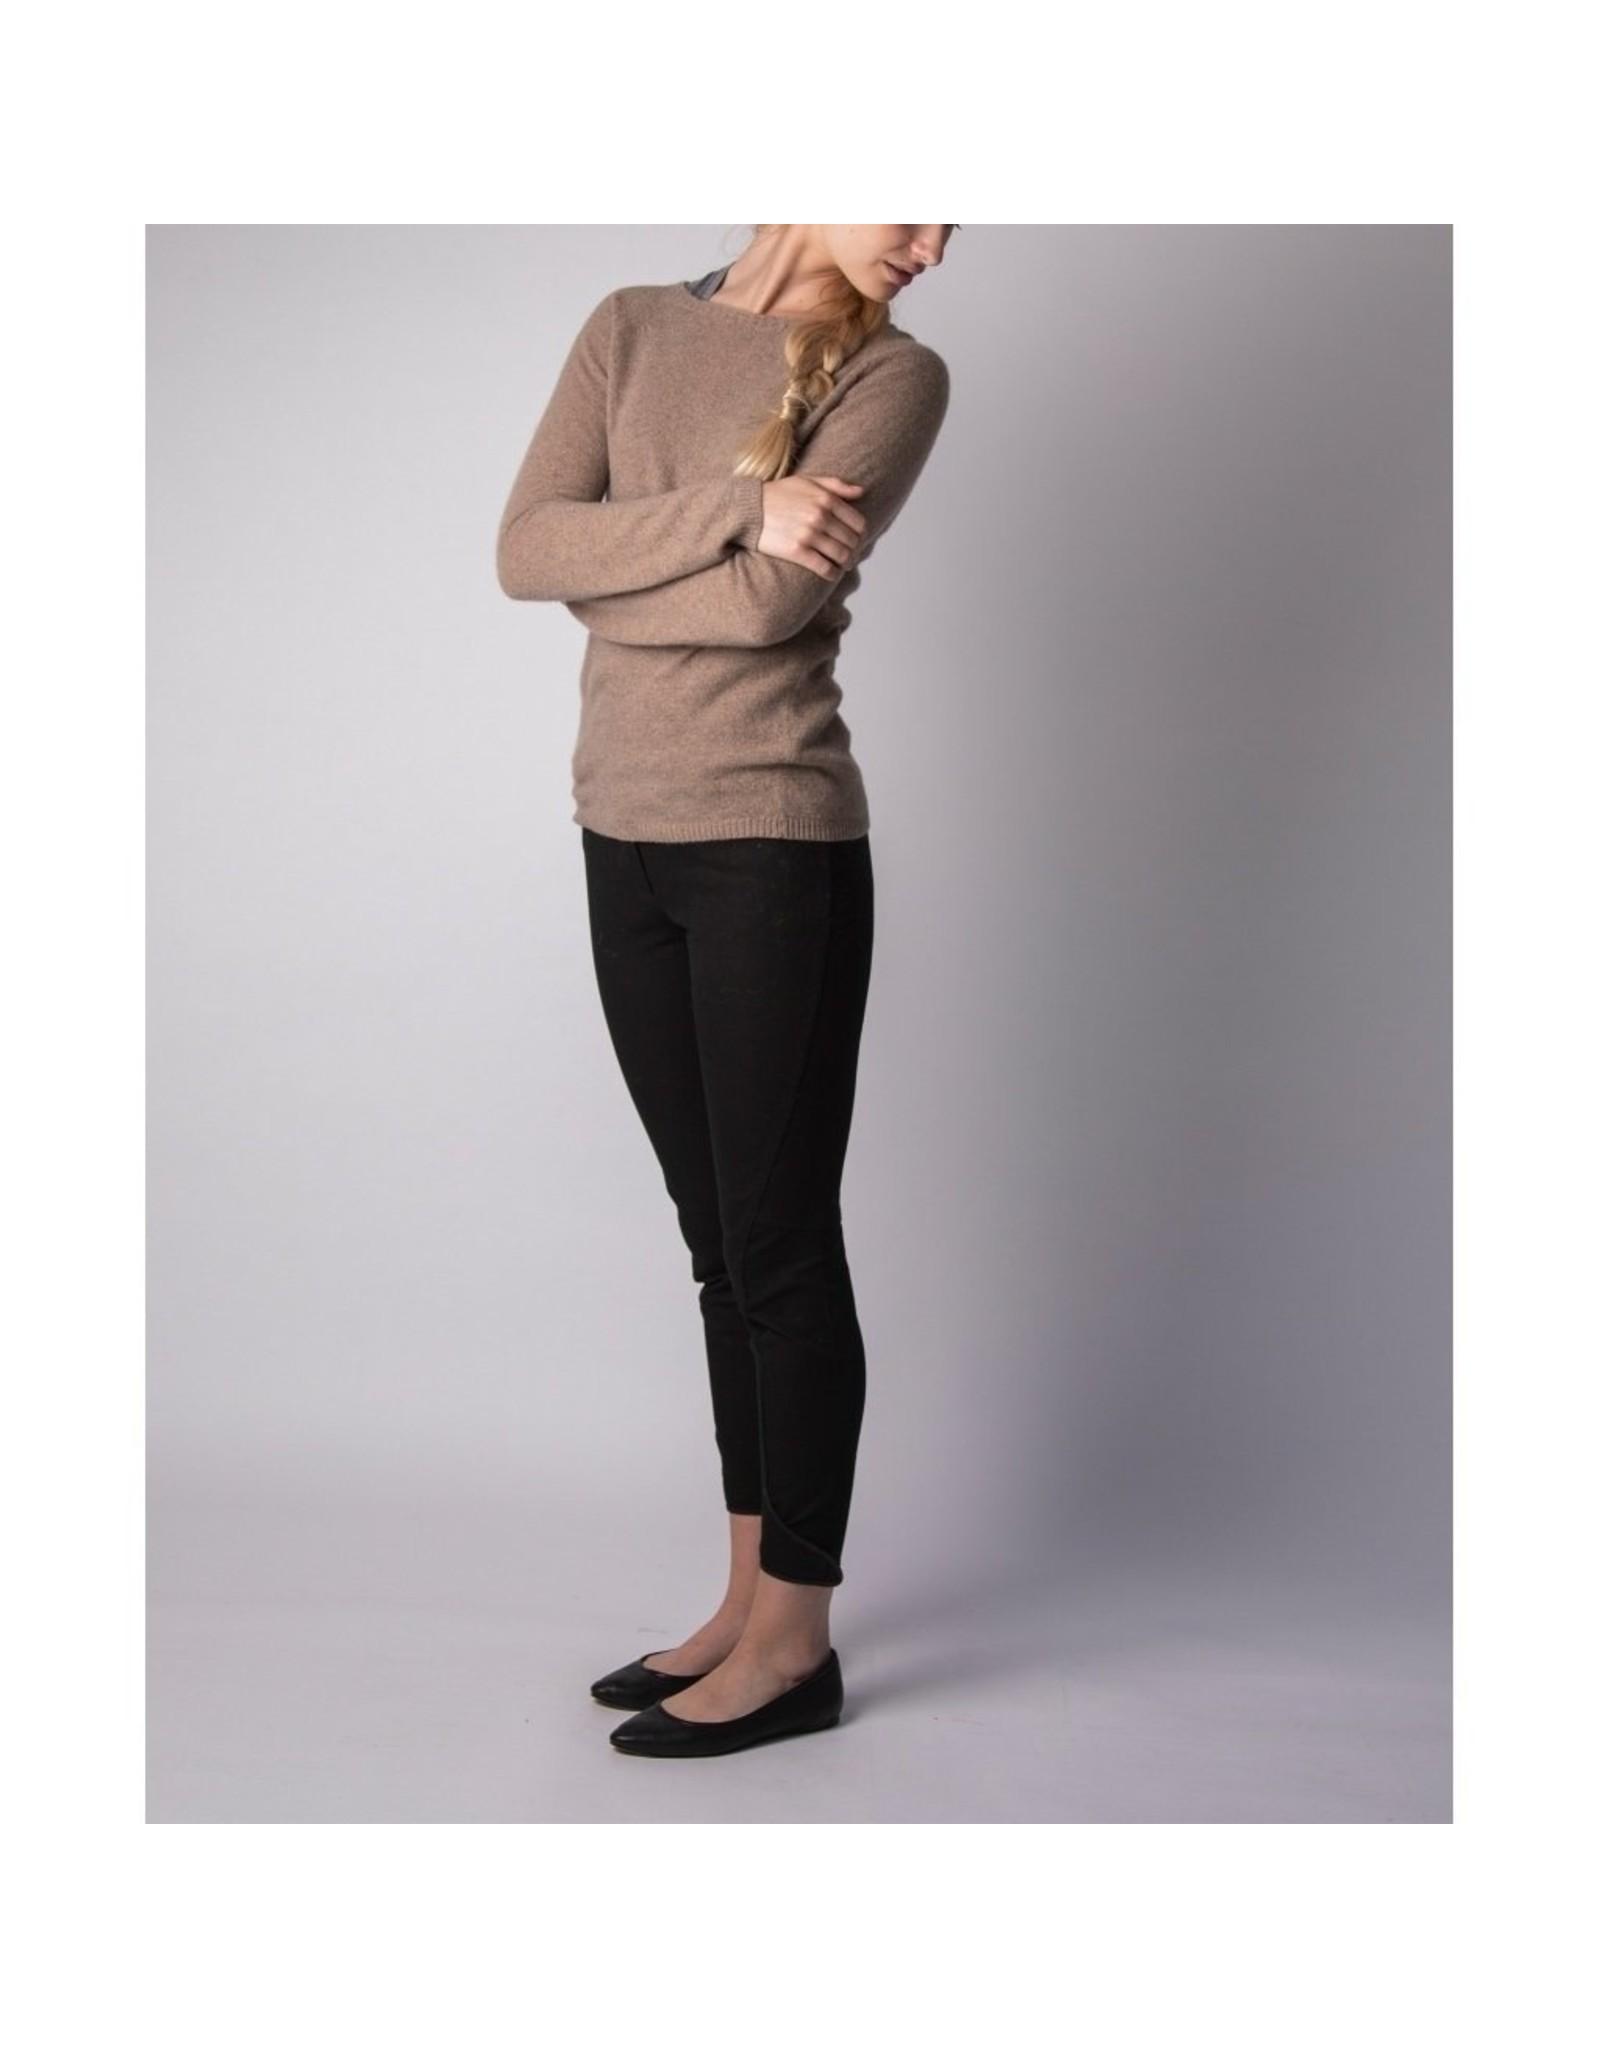 Gai & Lisva Elisabeth - 100% Recycled Cashmere Sweater